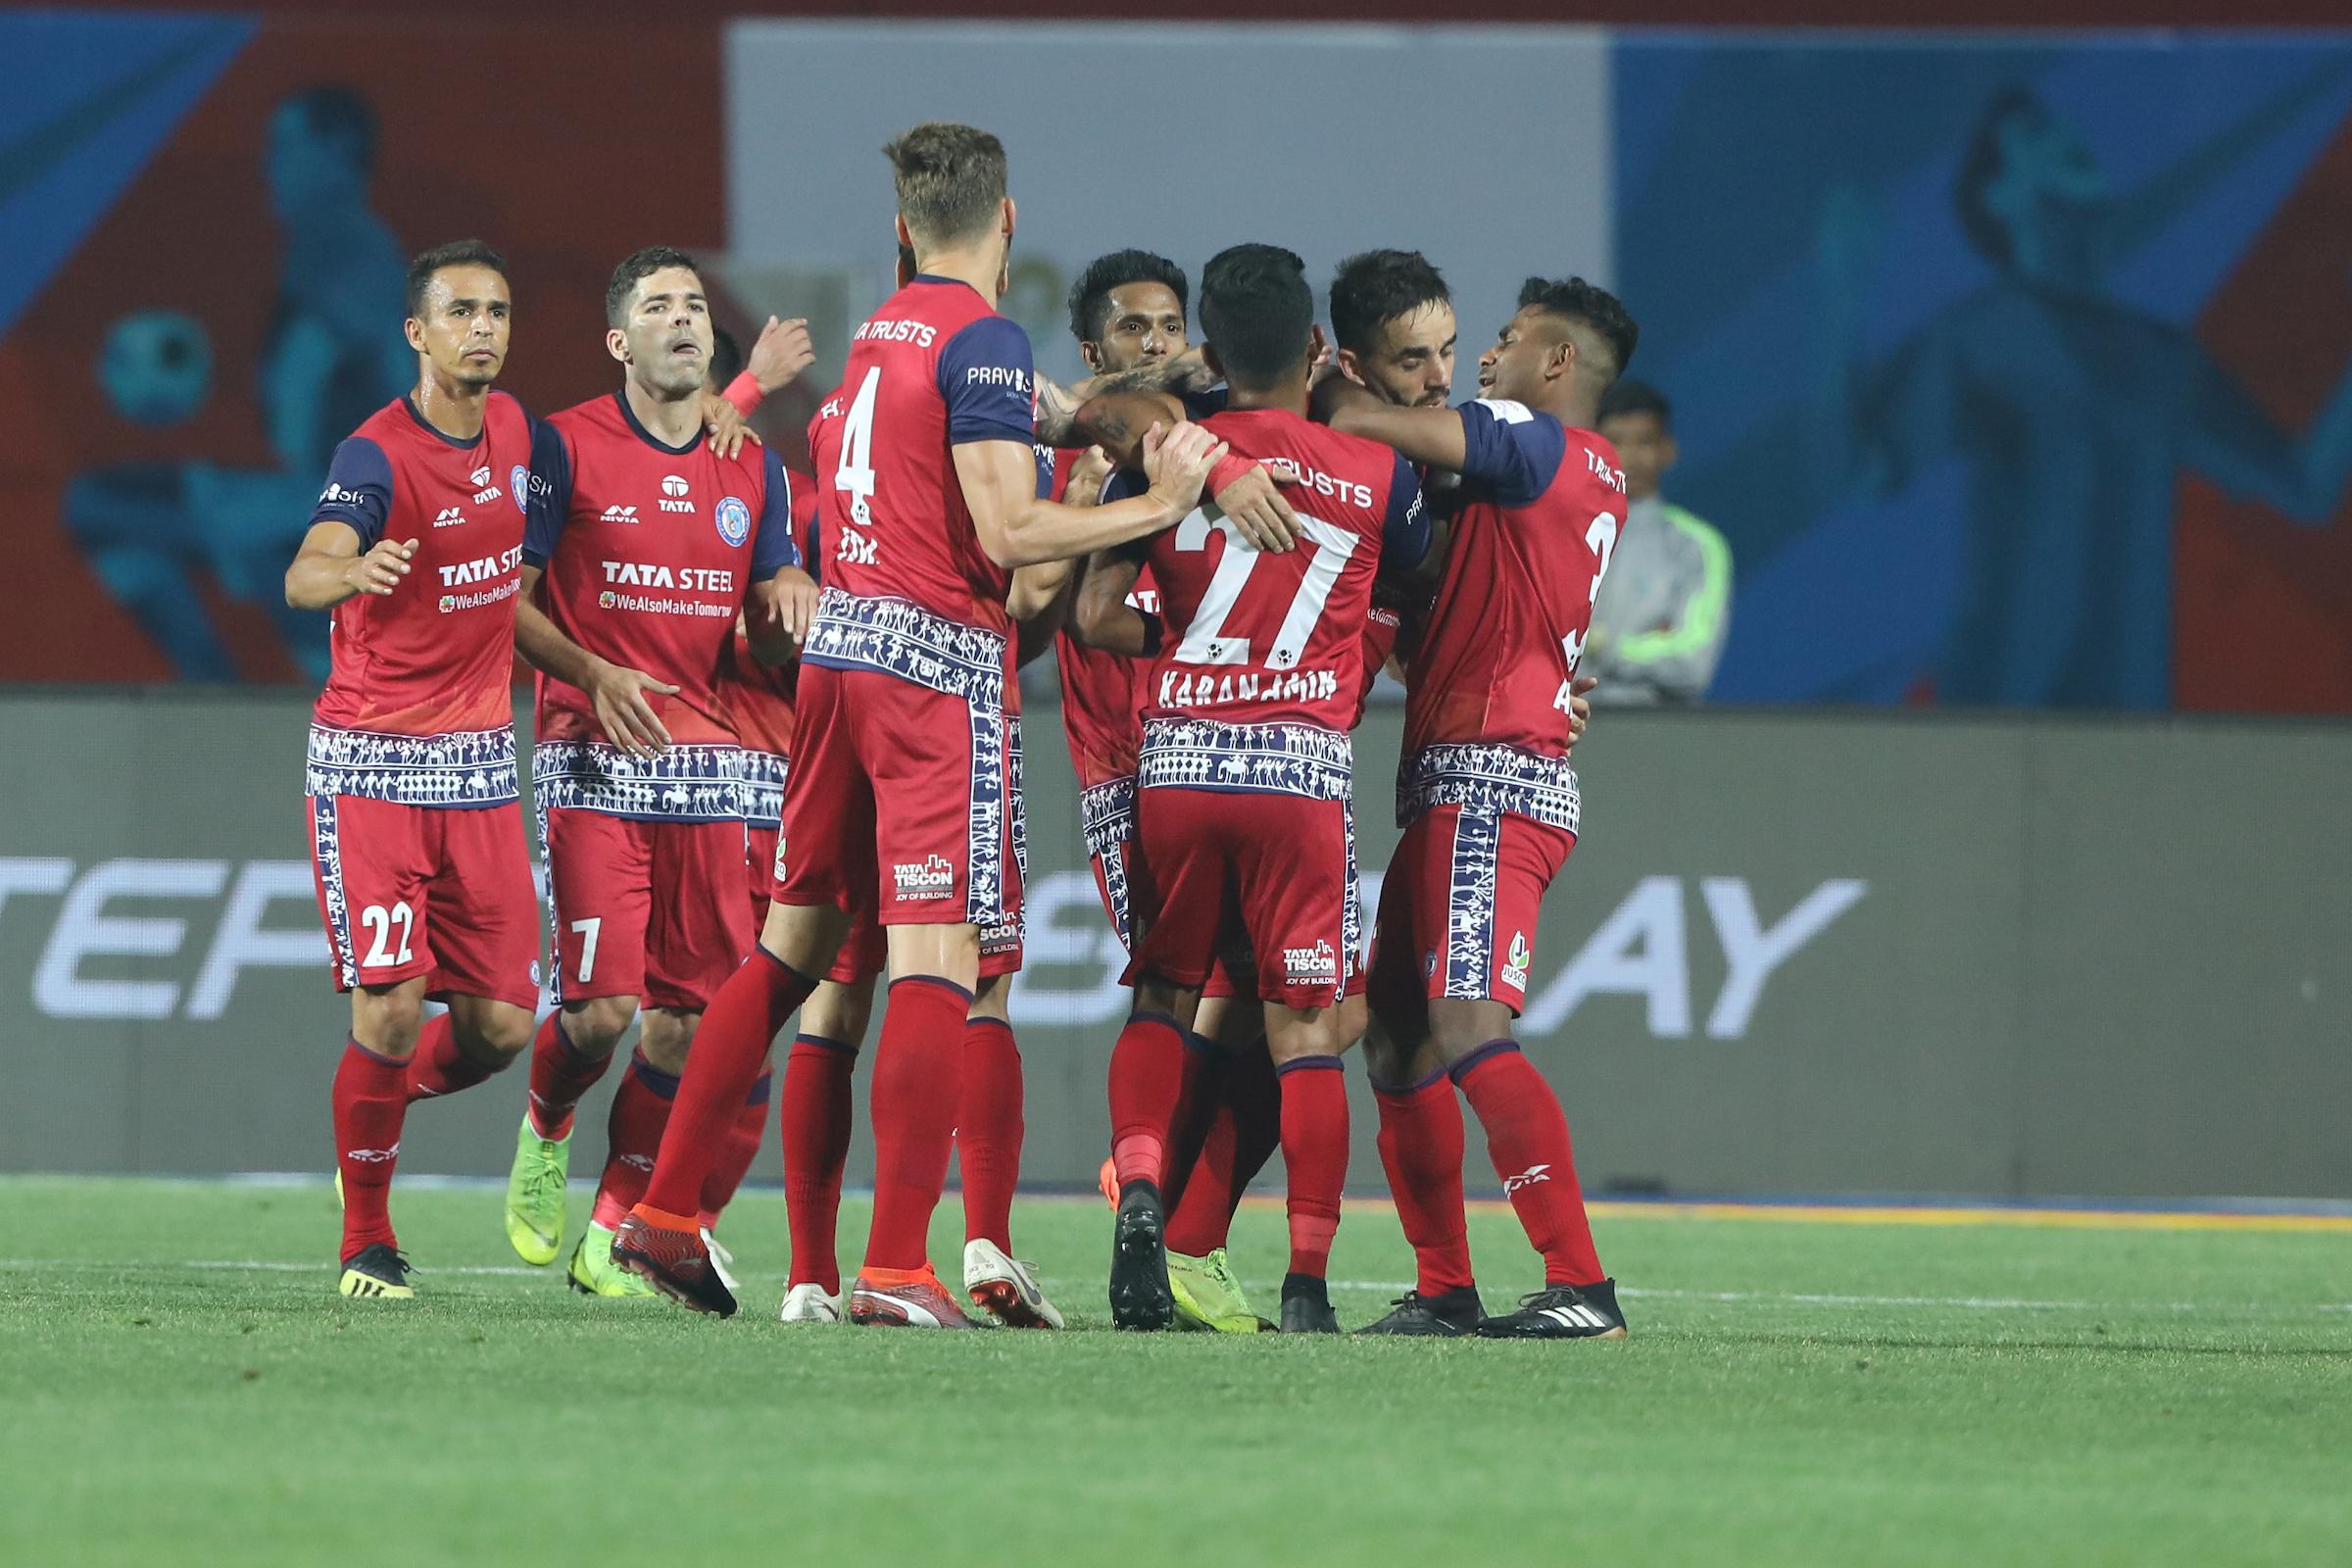 Jamshedpur v Bengaluru, Indian Super League